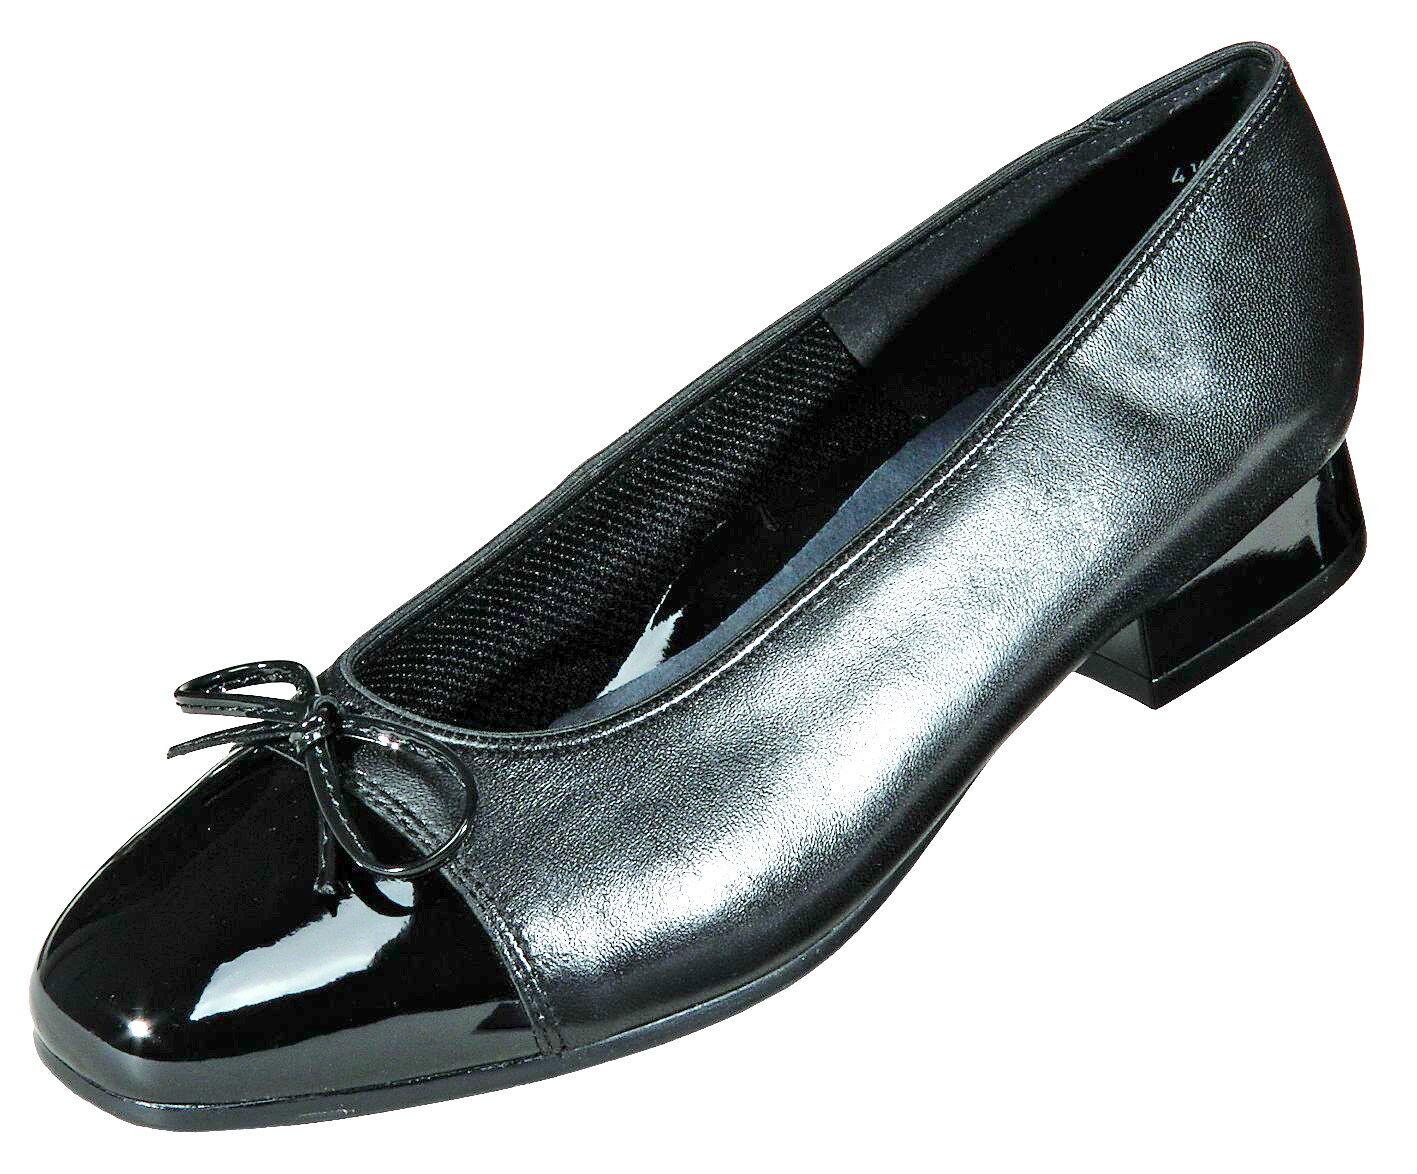 Ara Chaussures Femmes Chaussures Classique Ballerines +++ NEUF +++